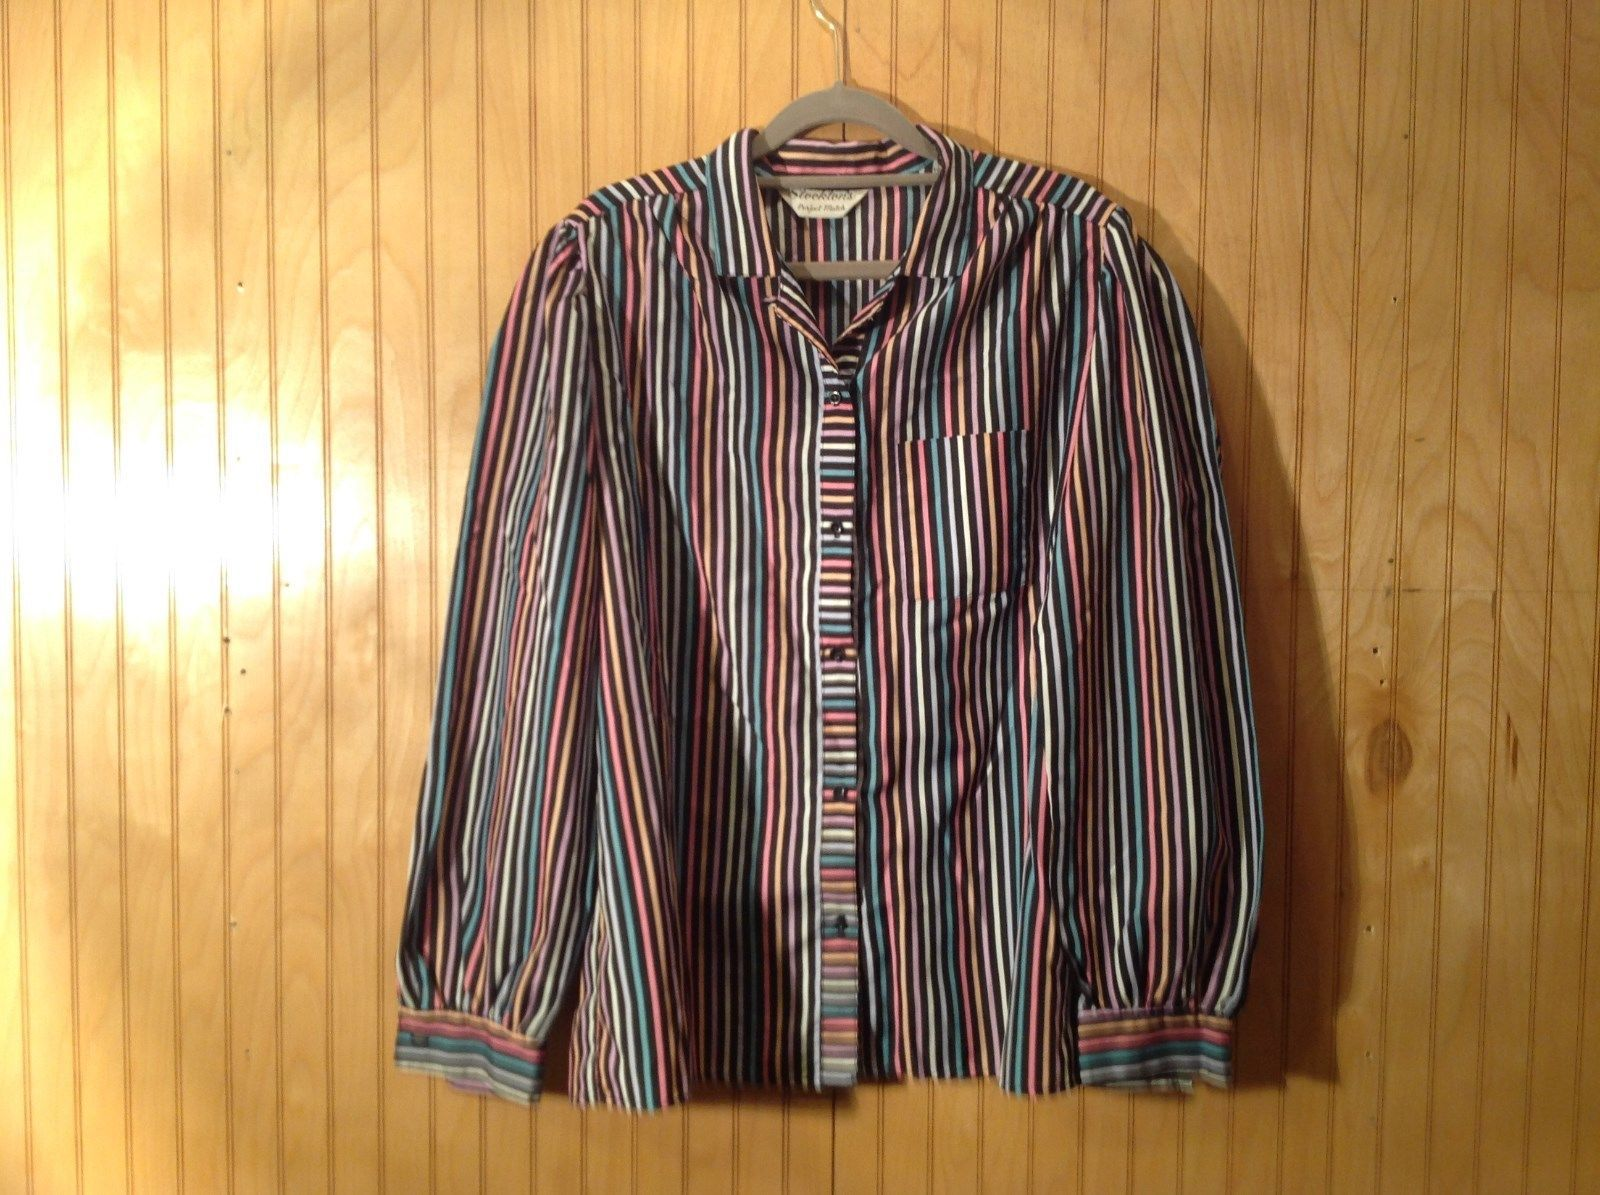 Stocktons Perfect Match Black Pink Blue Yellow Striped Shirt Size 16 by 31